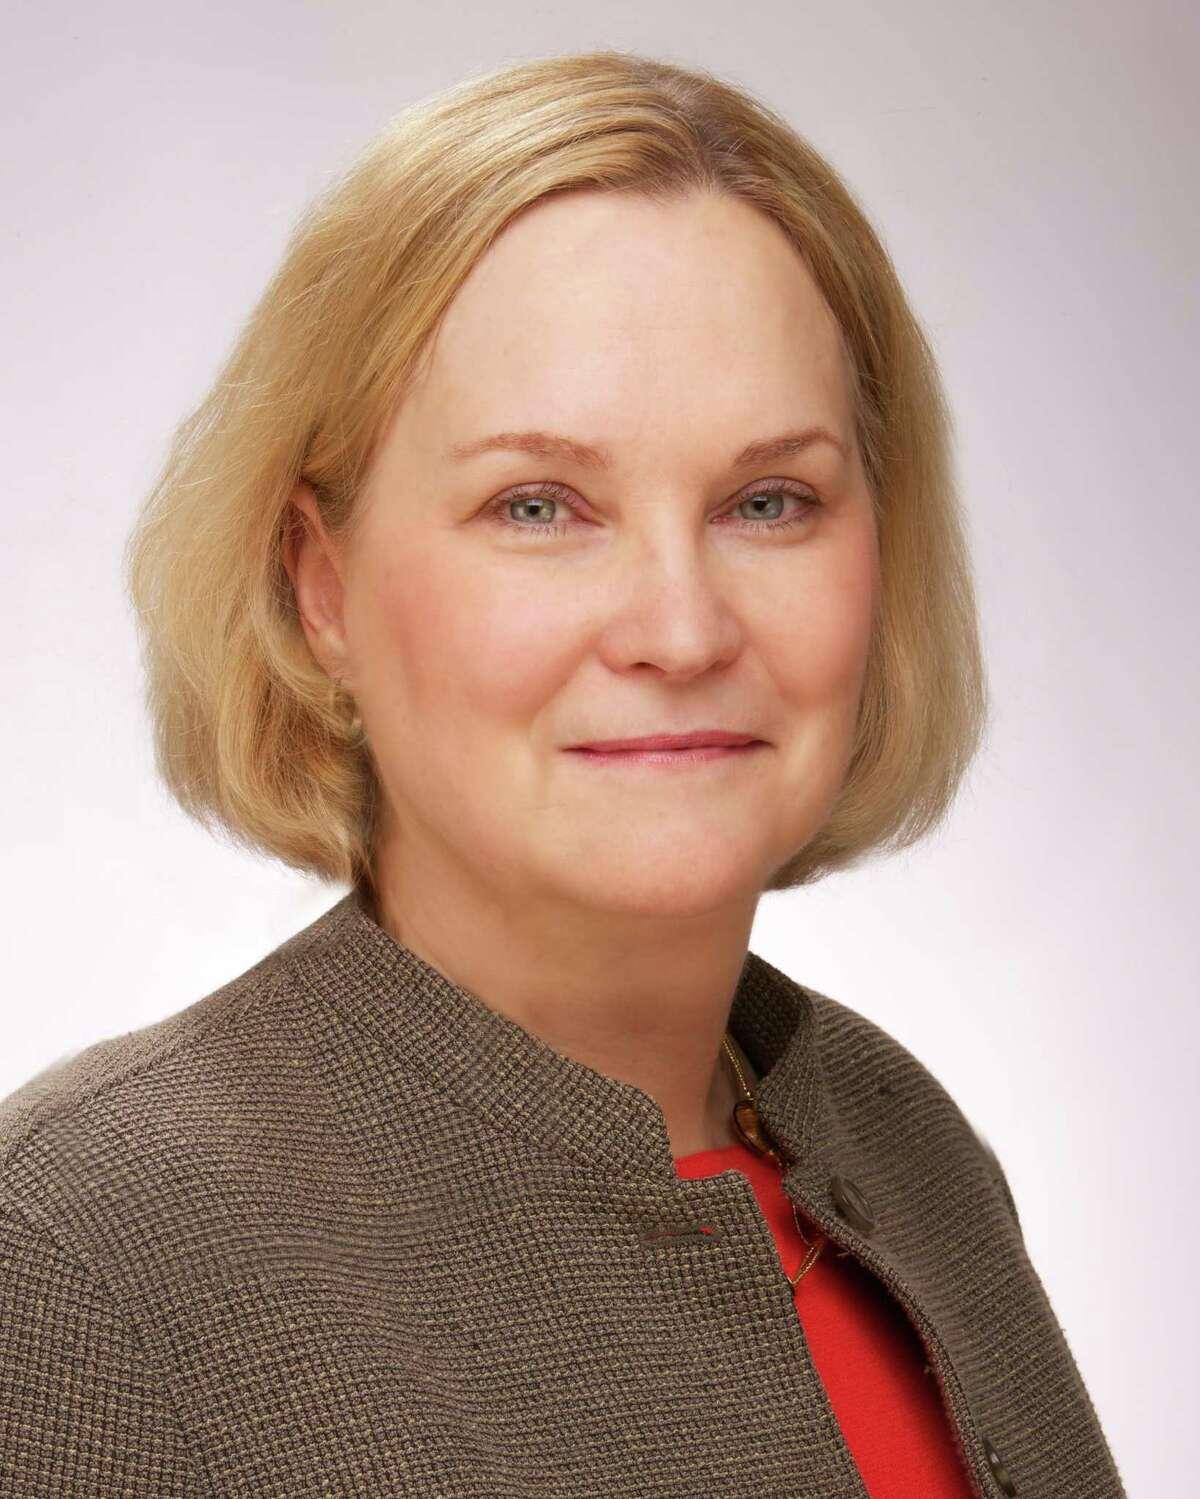 Karen Wackerman, the new moderator of the RTM.